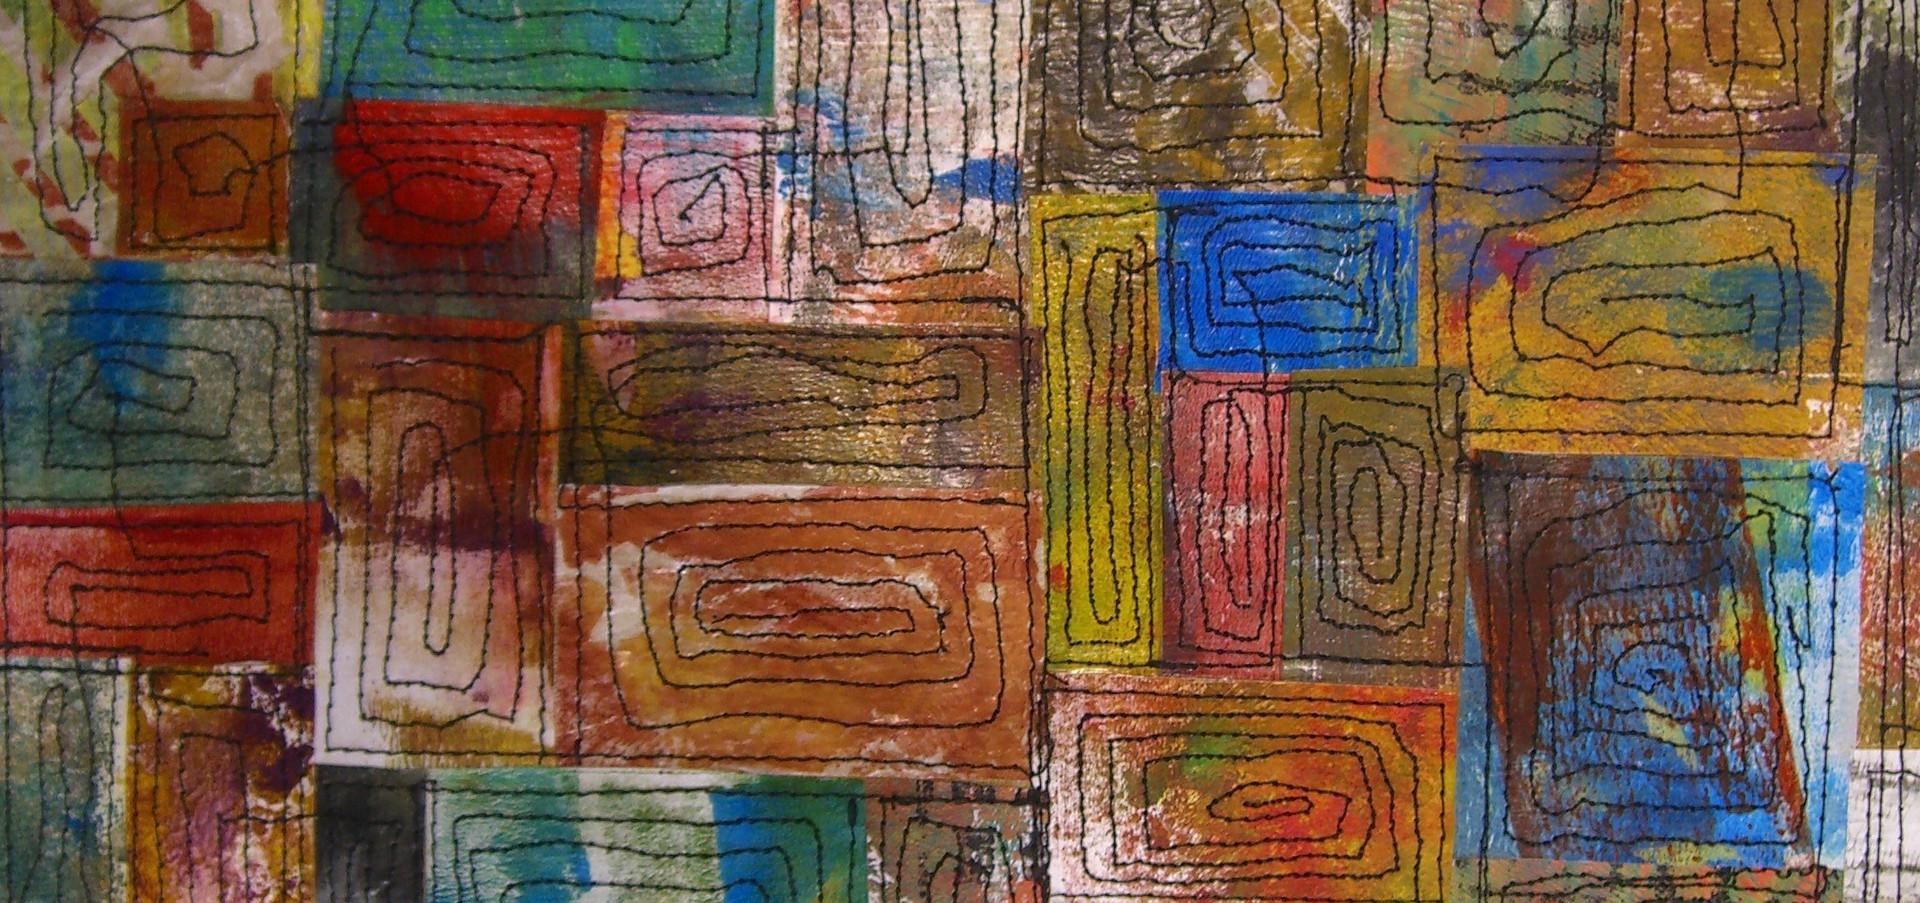 Painted Paper Quilt #4